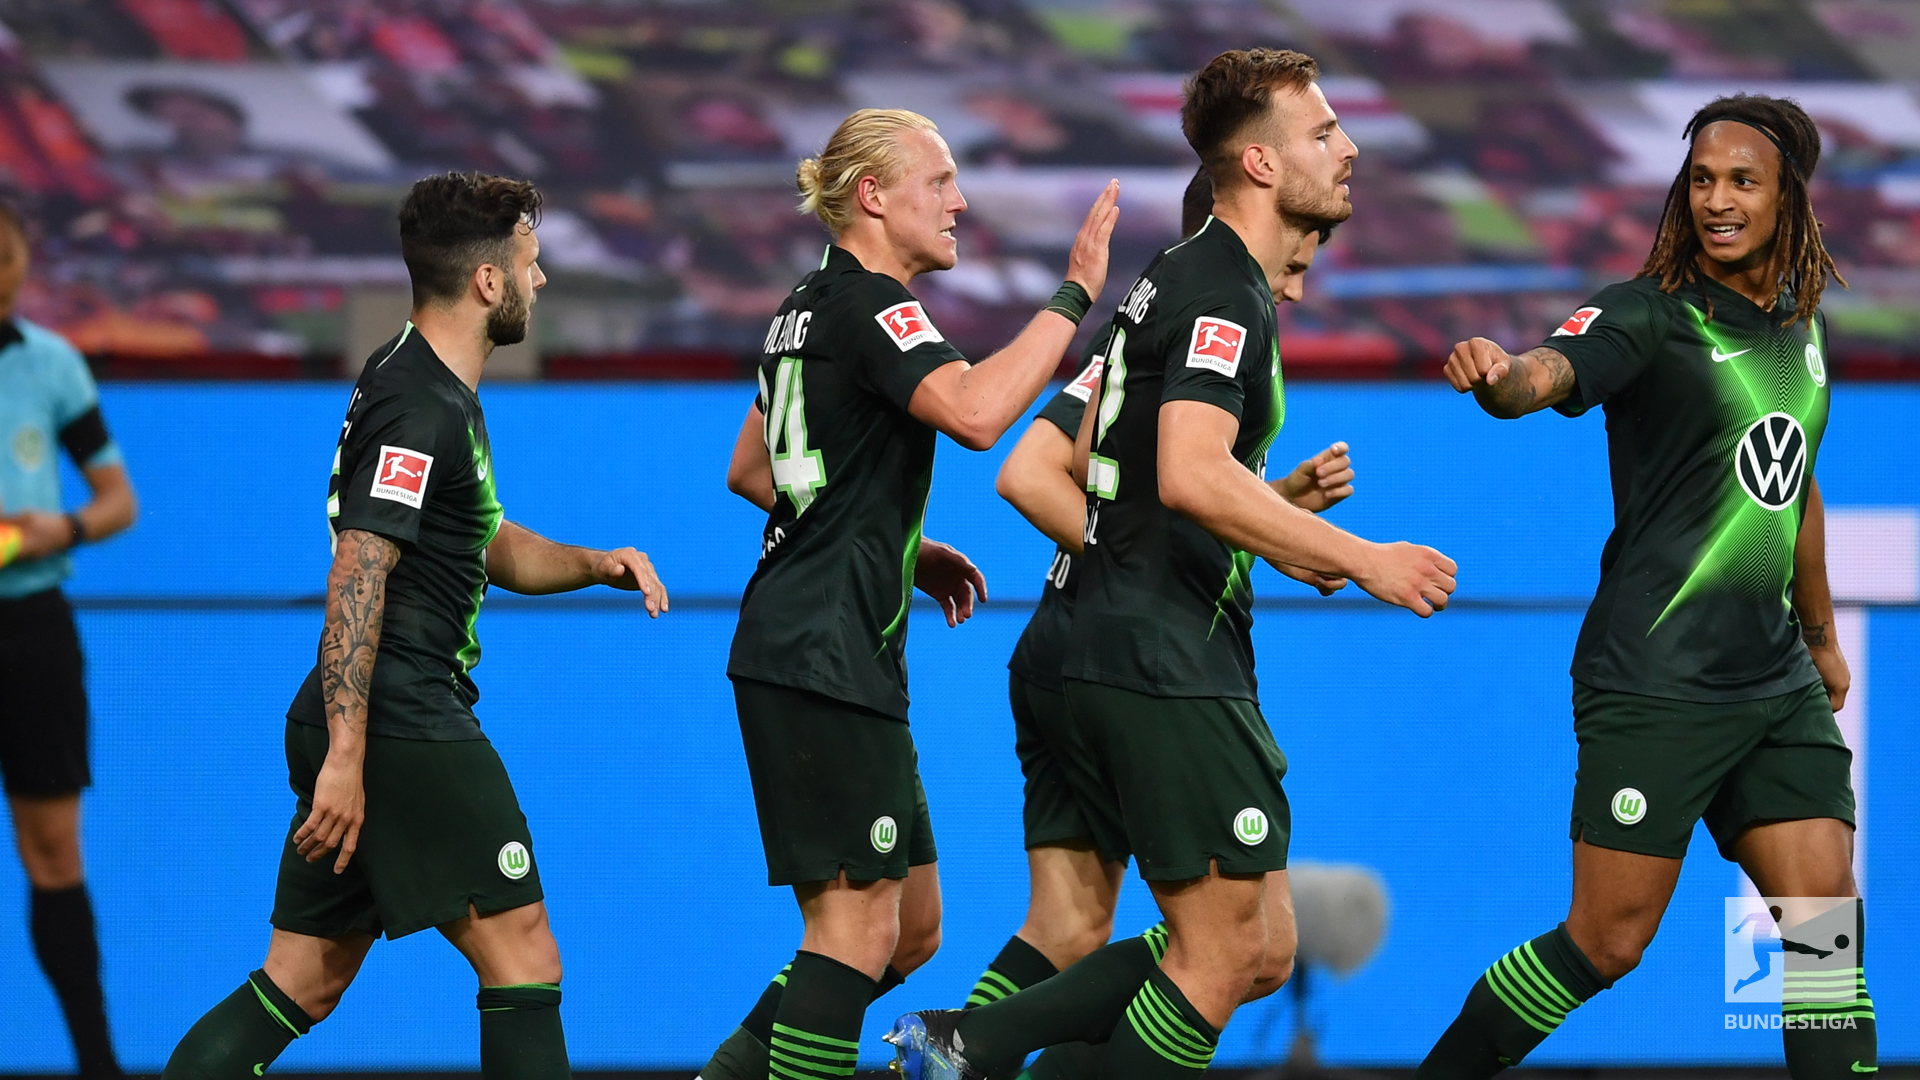 Bundesliga: Wolfsburg End Leverkusen Unbeaten Run; Frankfurt Hold Freiburg In Six-Goal Thriller